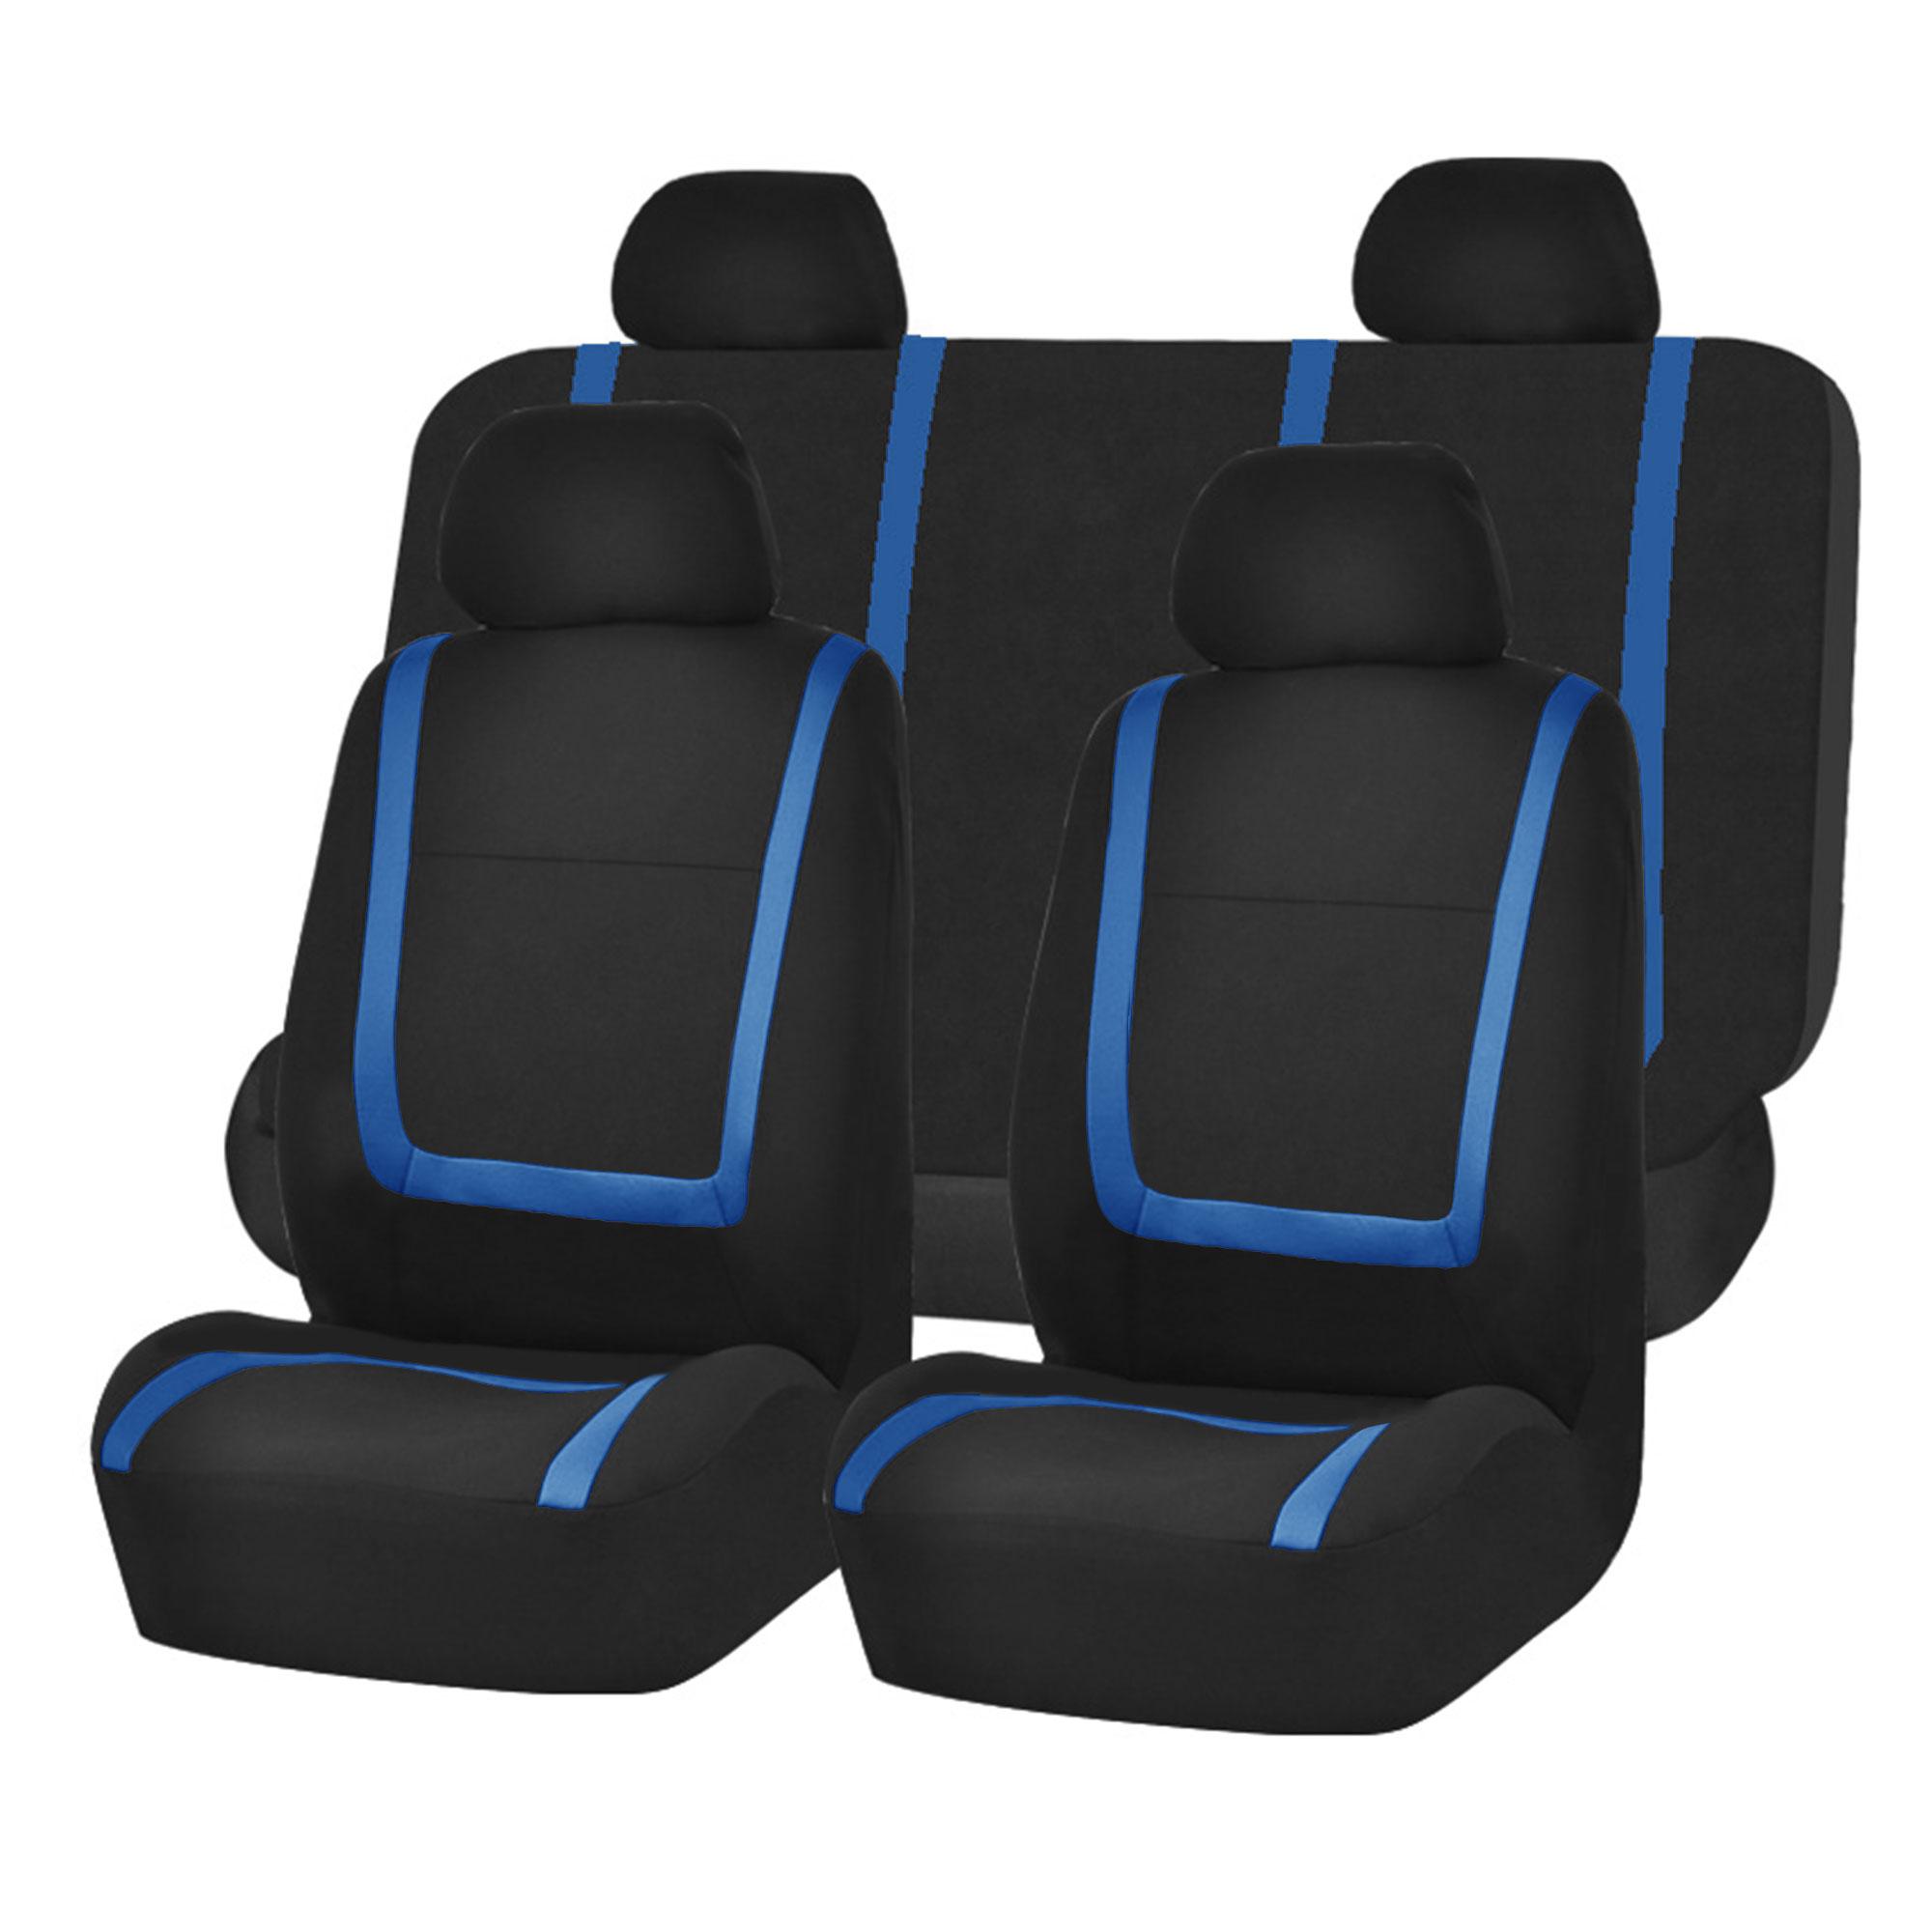 Auto Seat Covers For Car Sedan Truck Van Universal 12 Colors 0